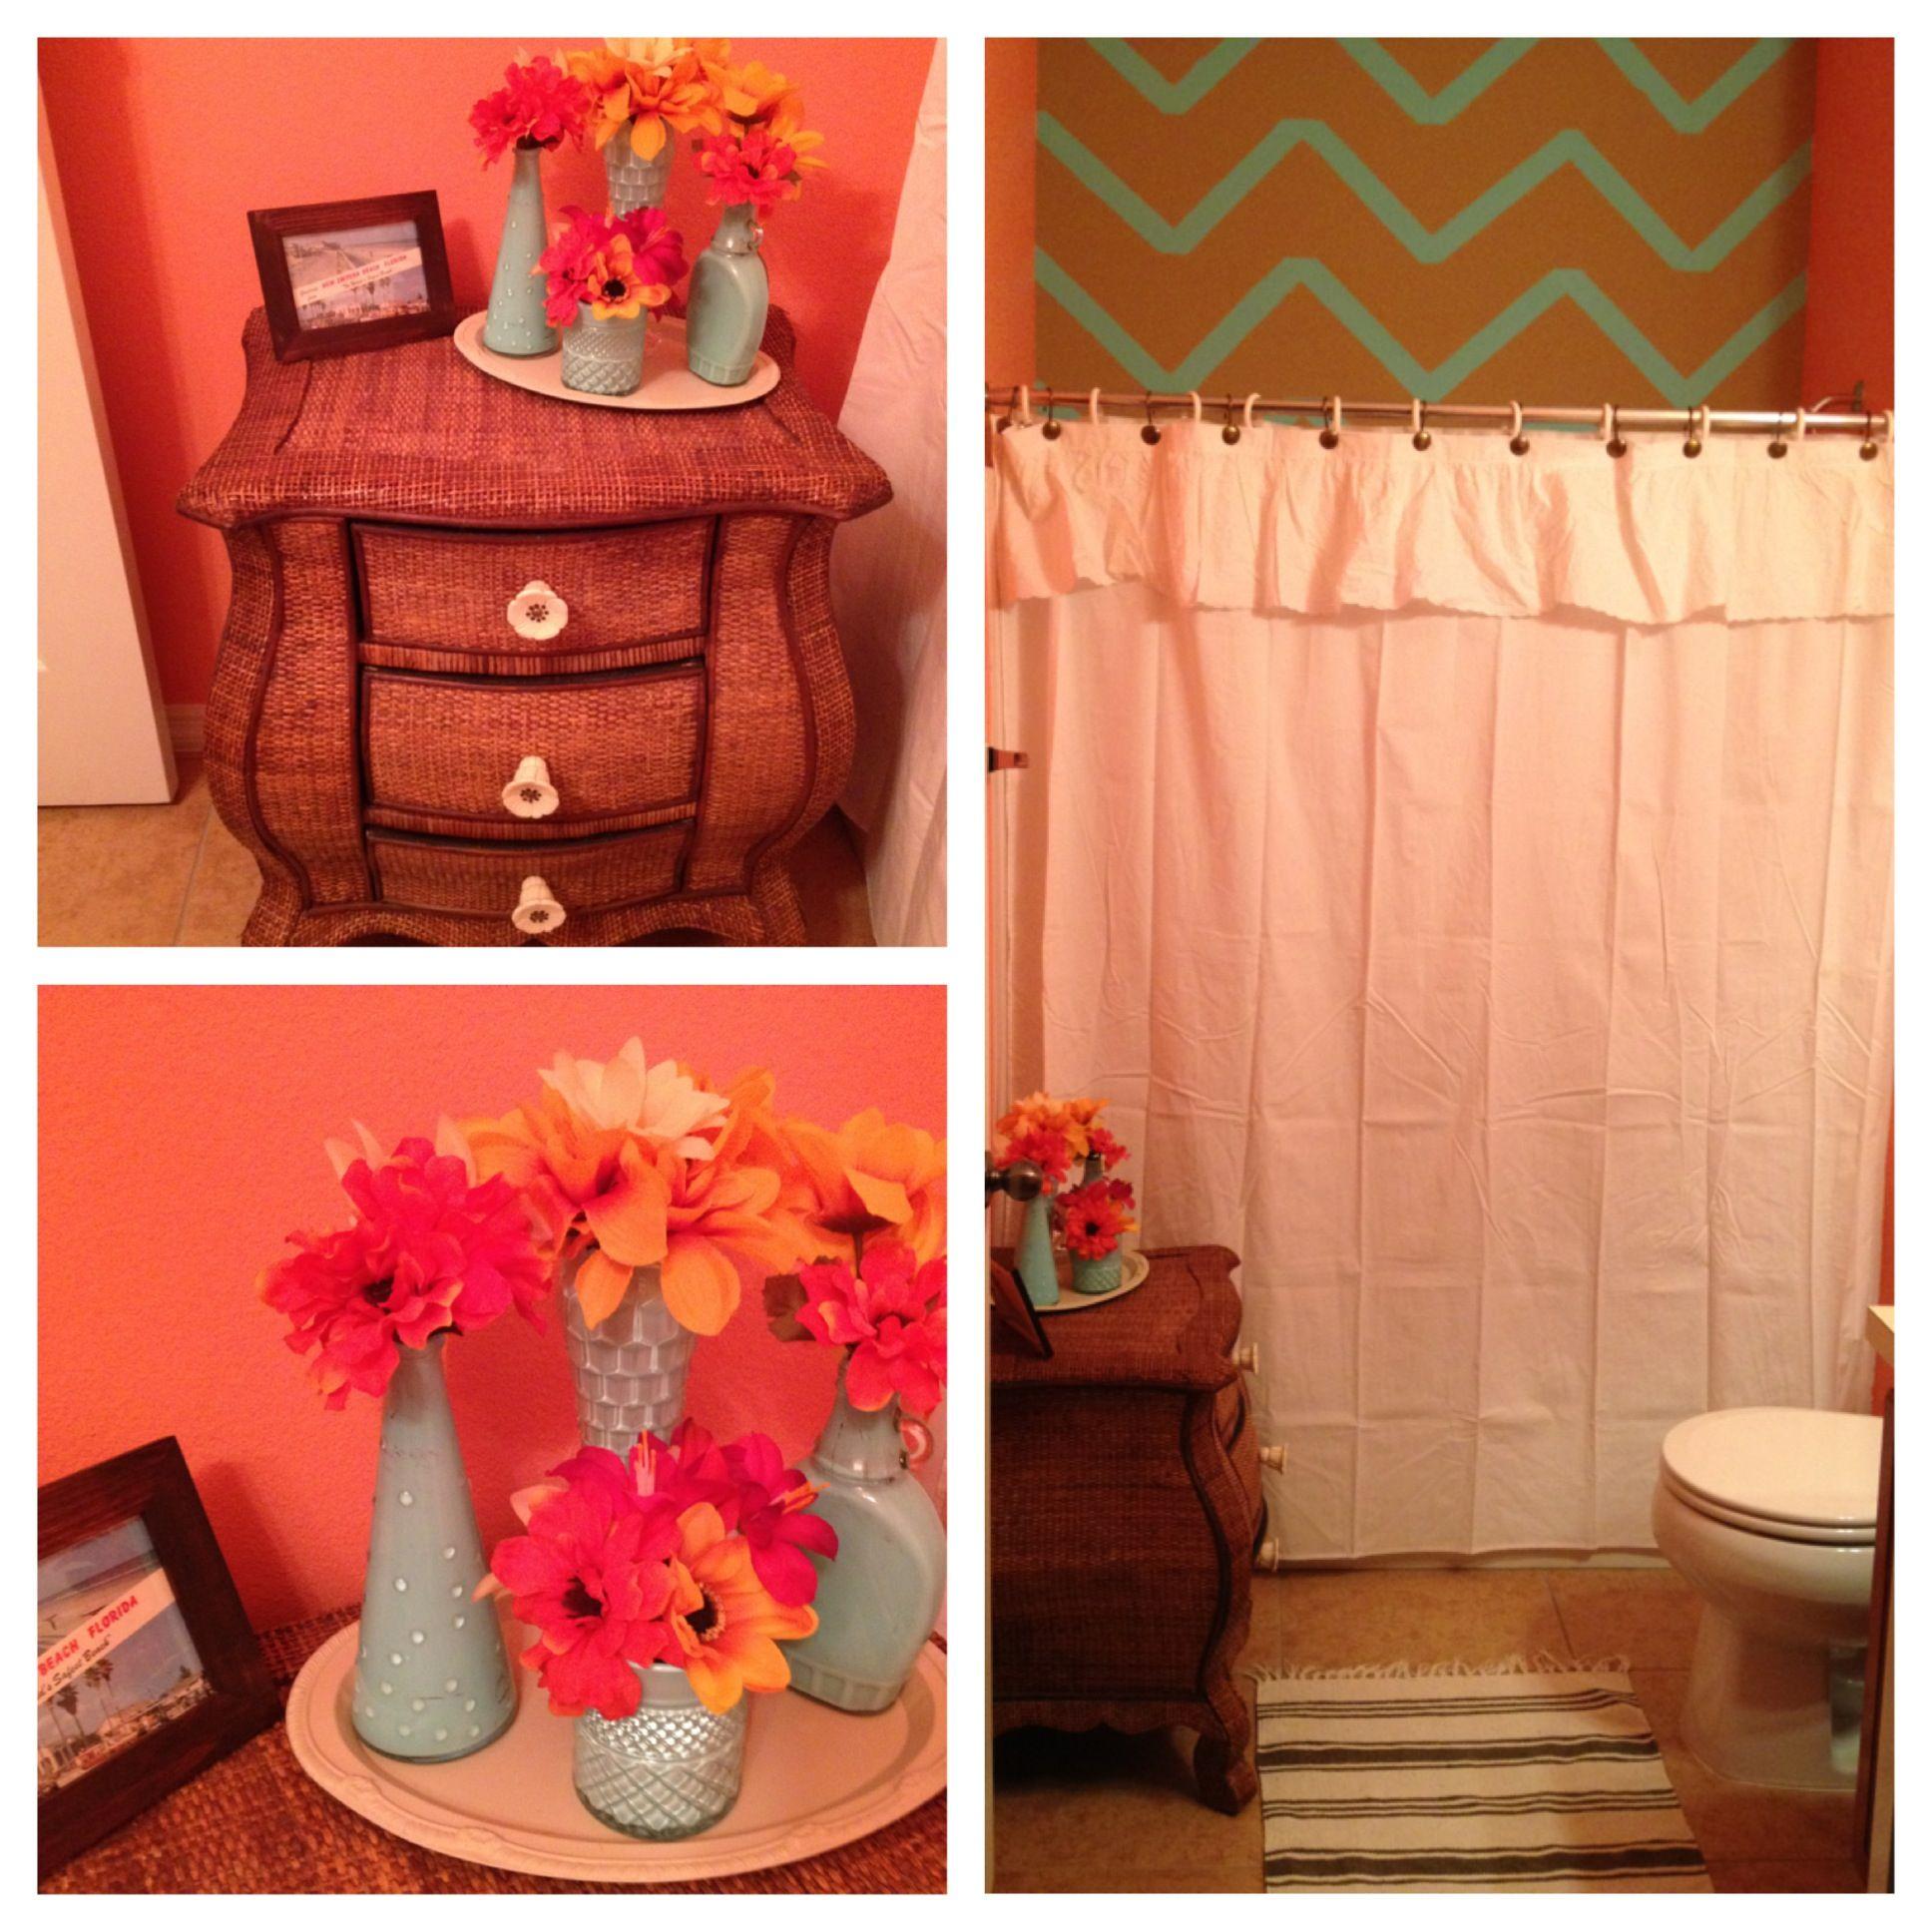 Coral Bathroom Decor Aqua And Coral Bathroom Decor With Beige And Aqua Chevron Accent